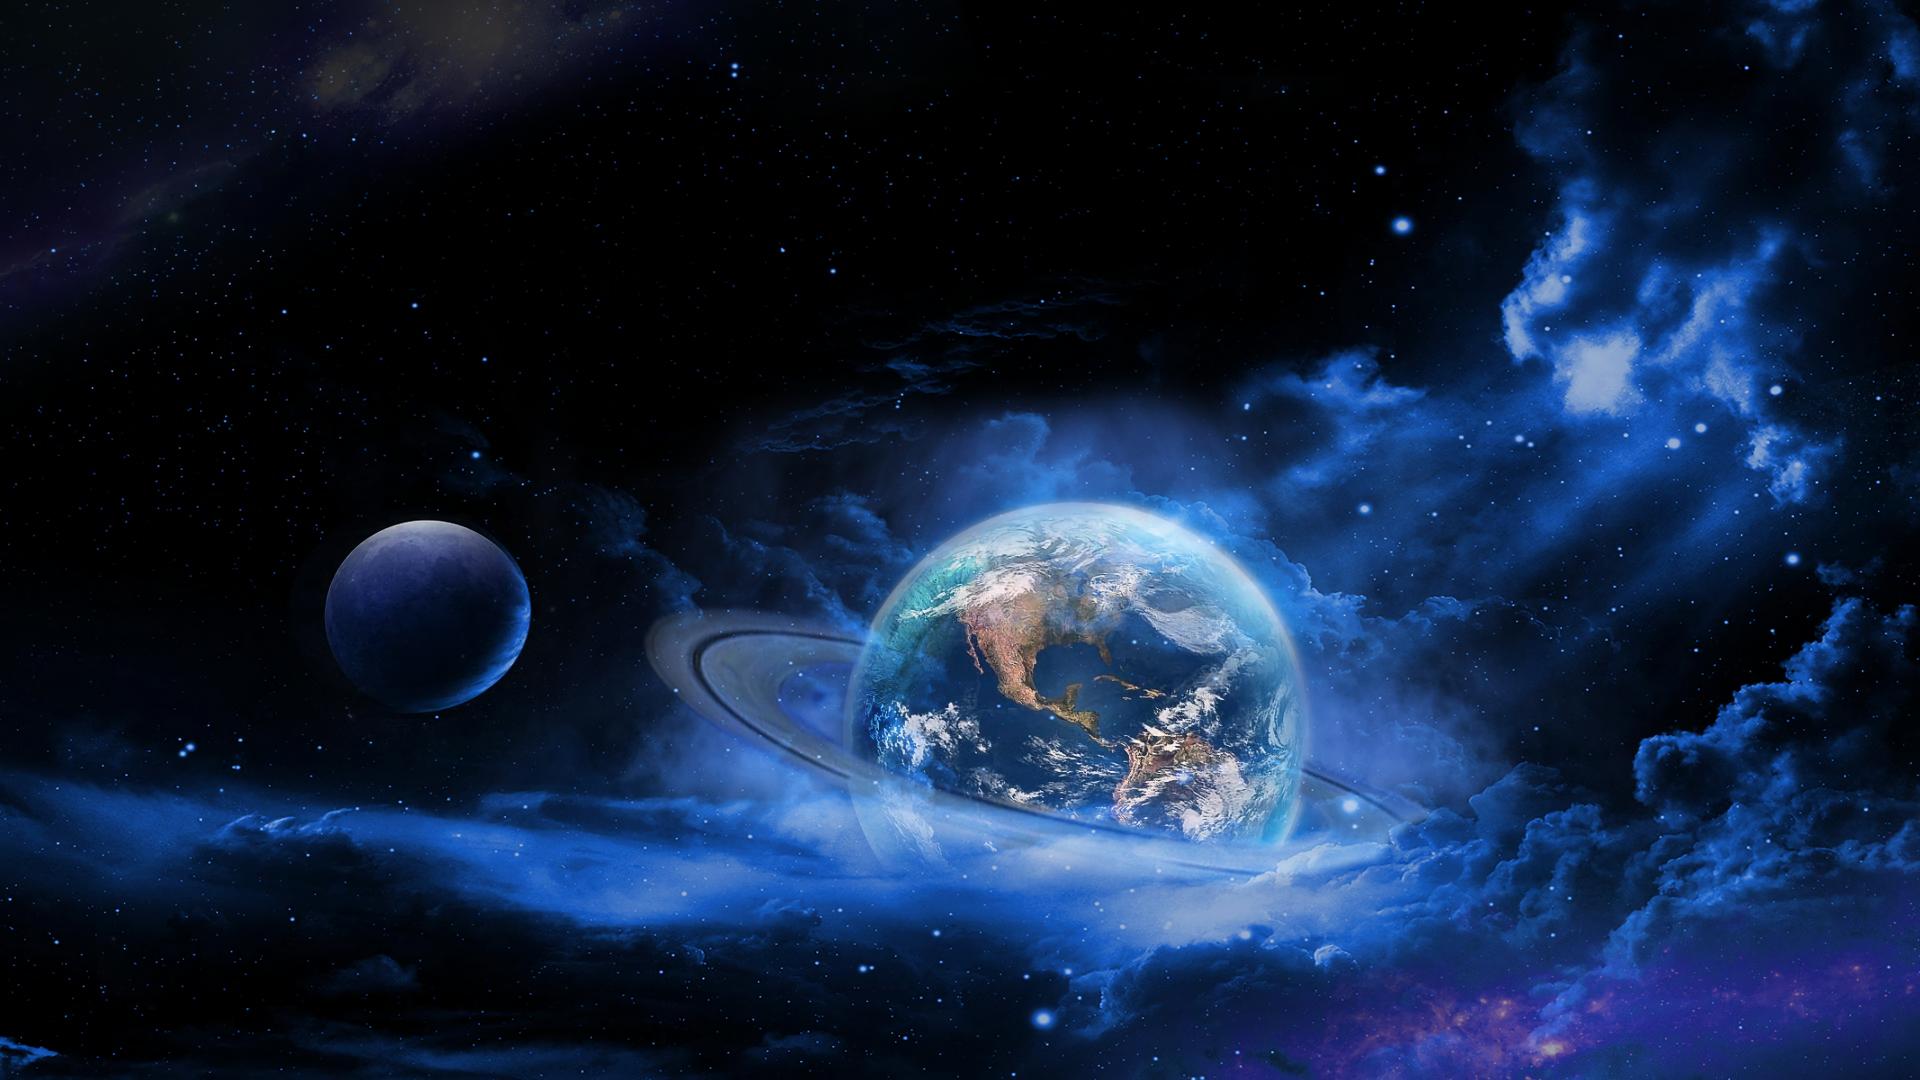 Planeta Fondo De Pantalla HD